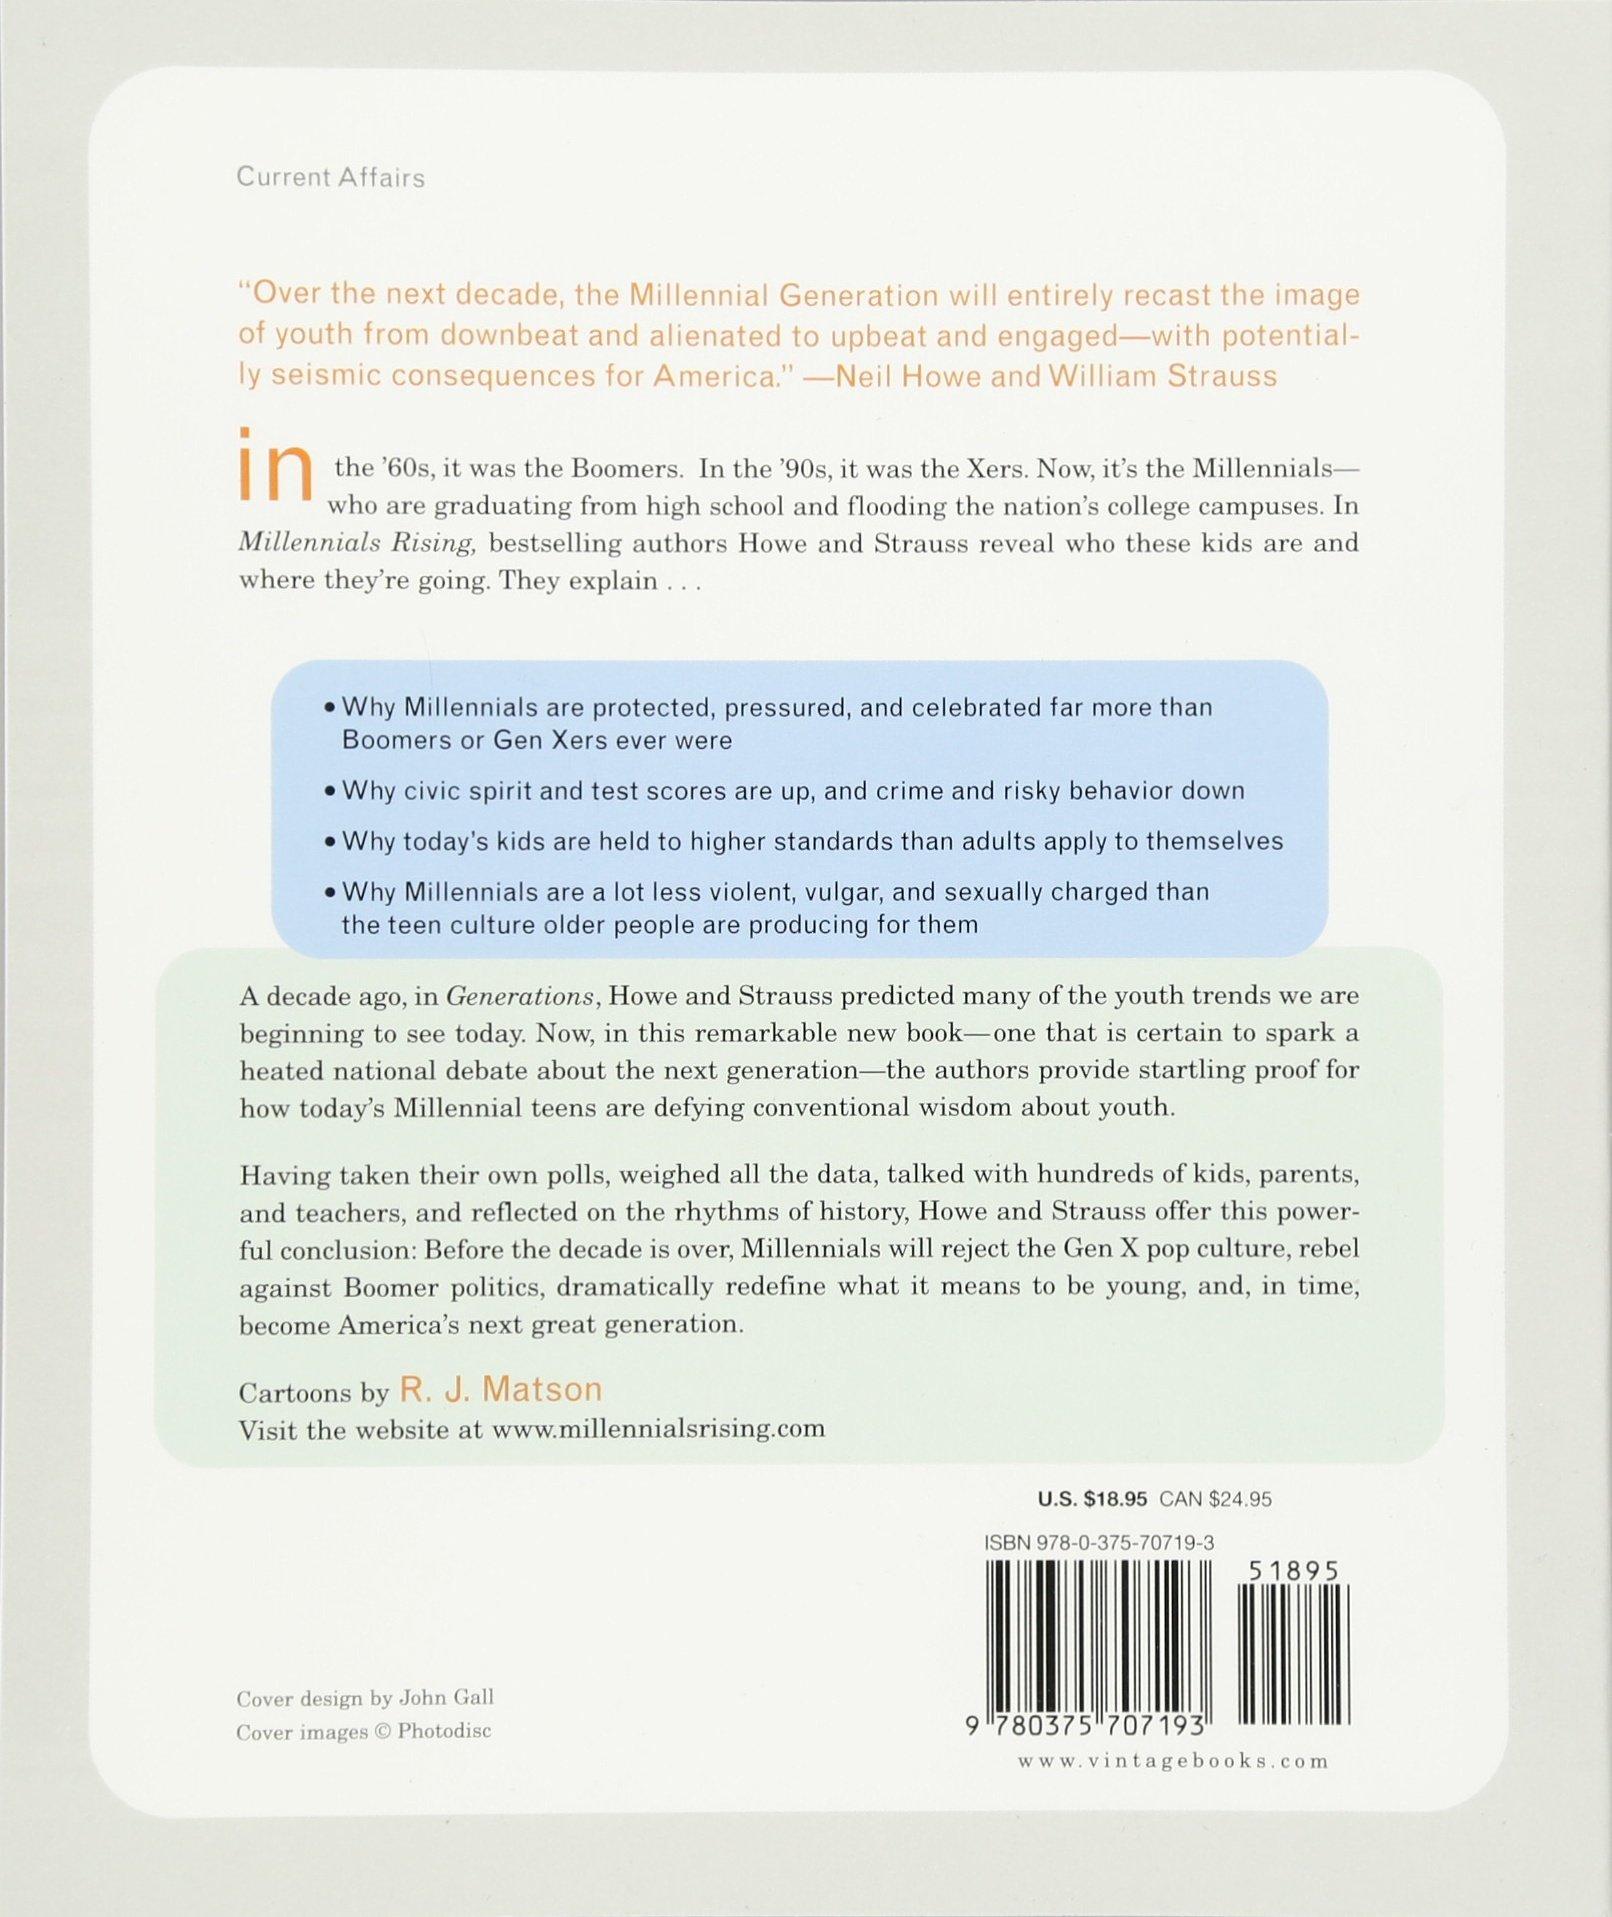 Millennials Rising: The Next Great Generation: Neil Howe, William Strauss,  Rj Matson: 9780375707193: Amazon: Books